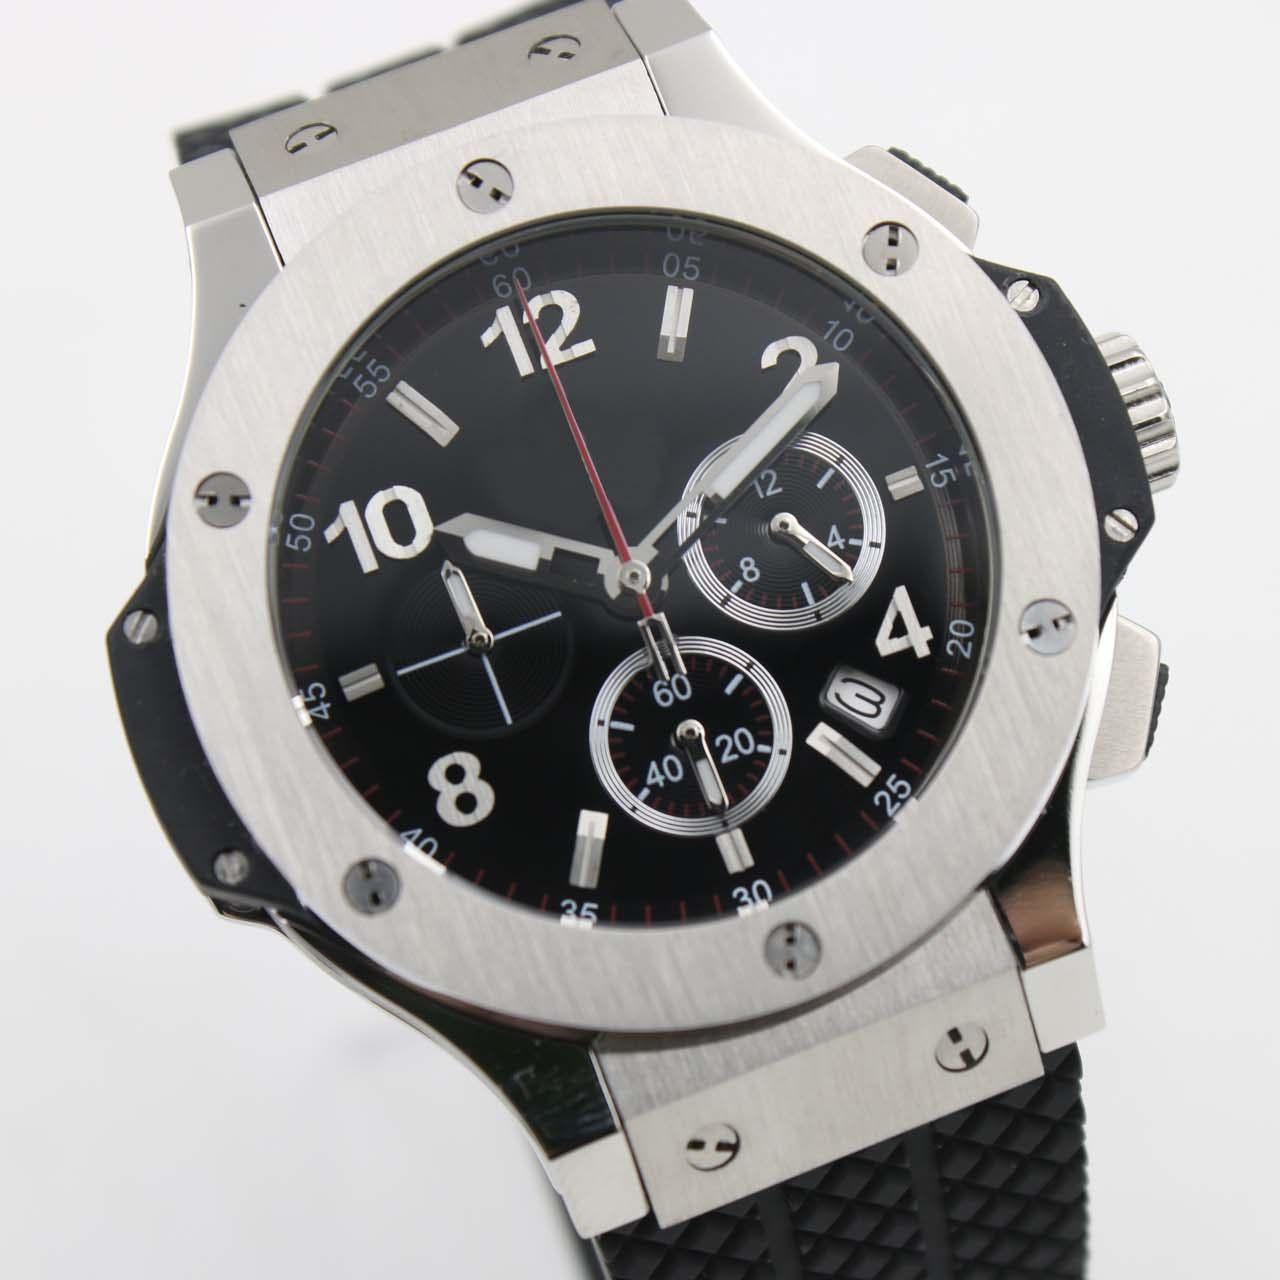 Relojes de hombre san jose costa rica